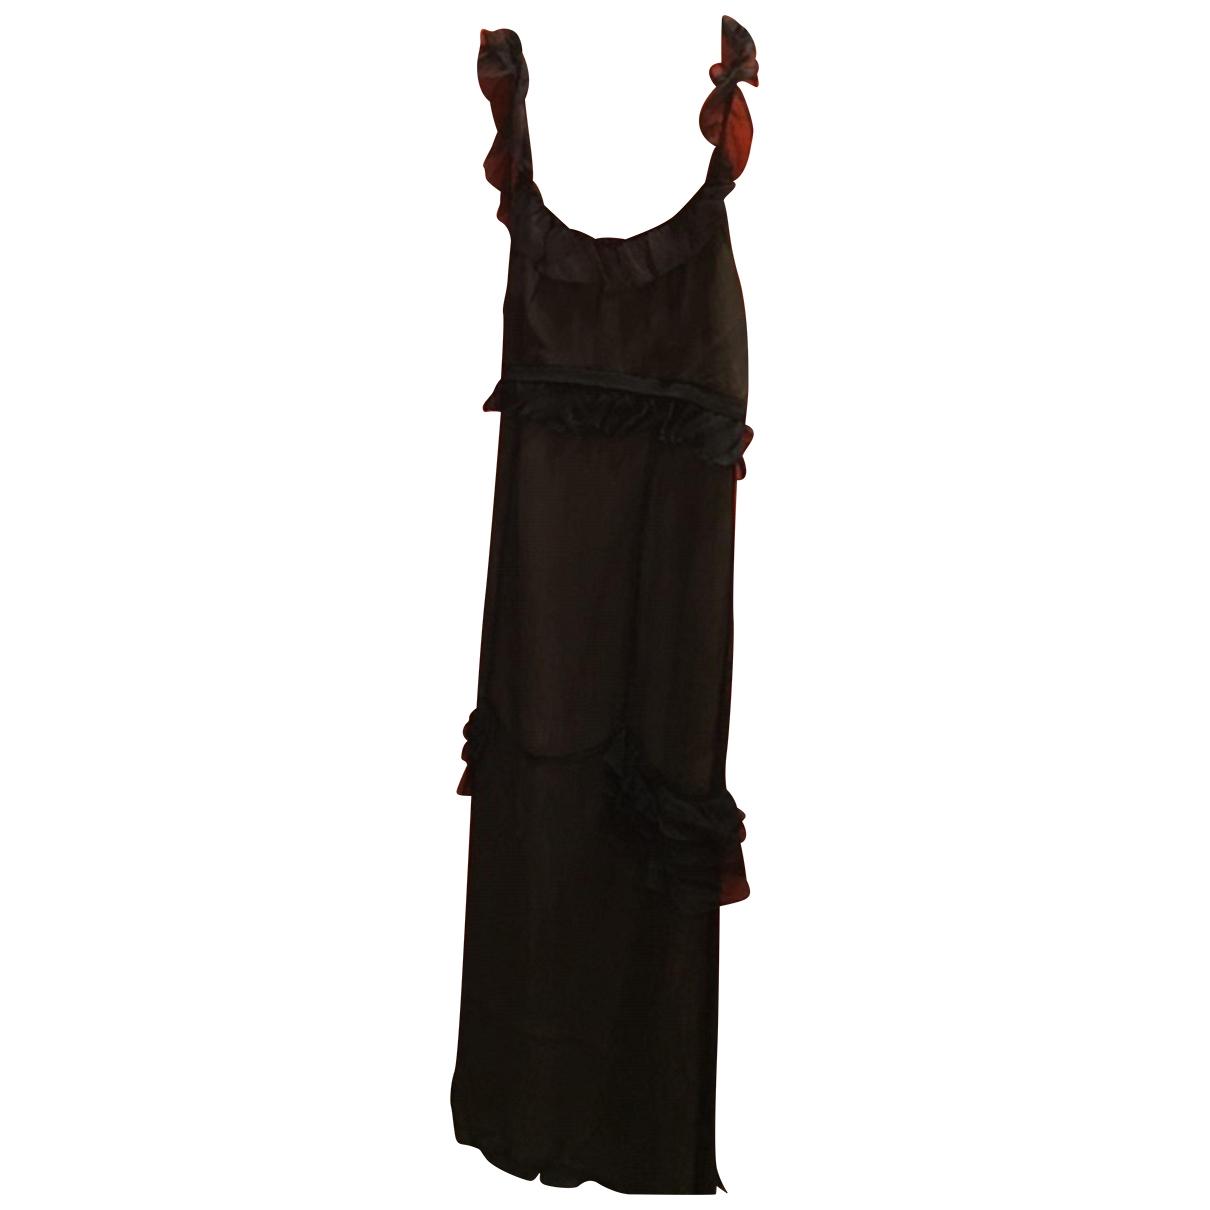 Vera Wang \N Black dress for Women 10 UK